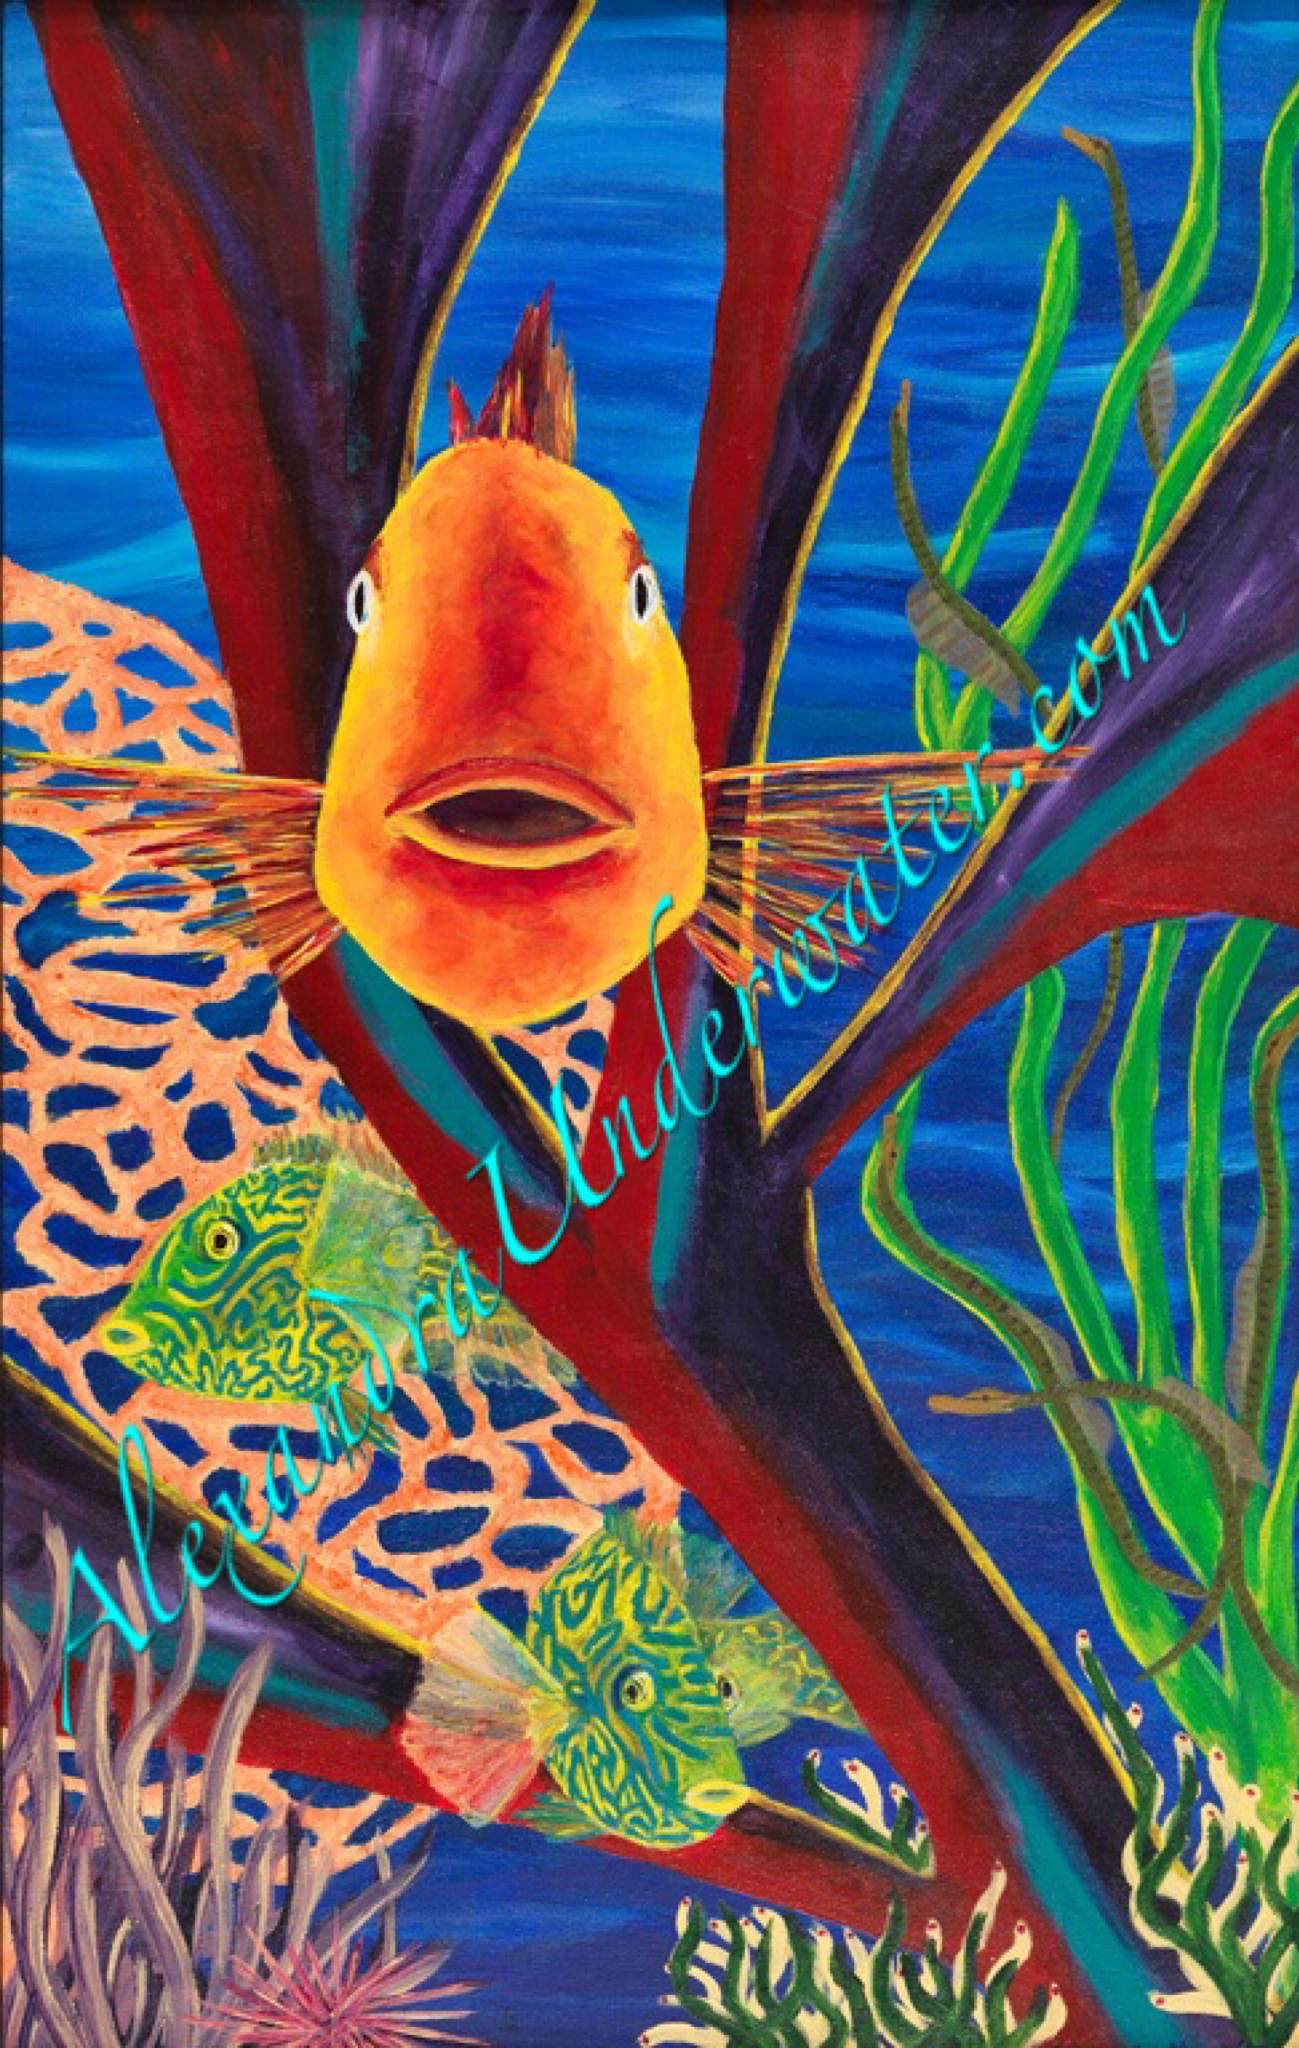 Giclée Prints - Alexandra: Underwater